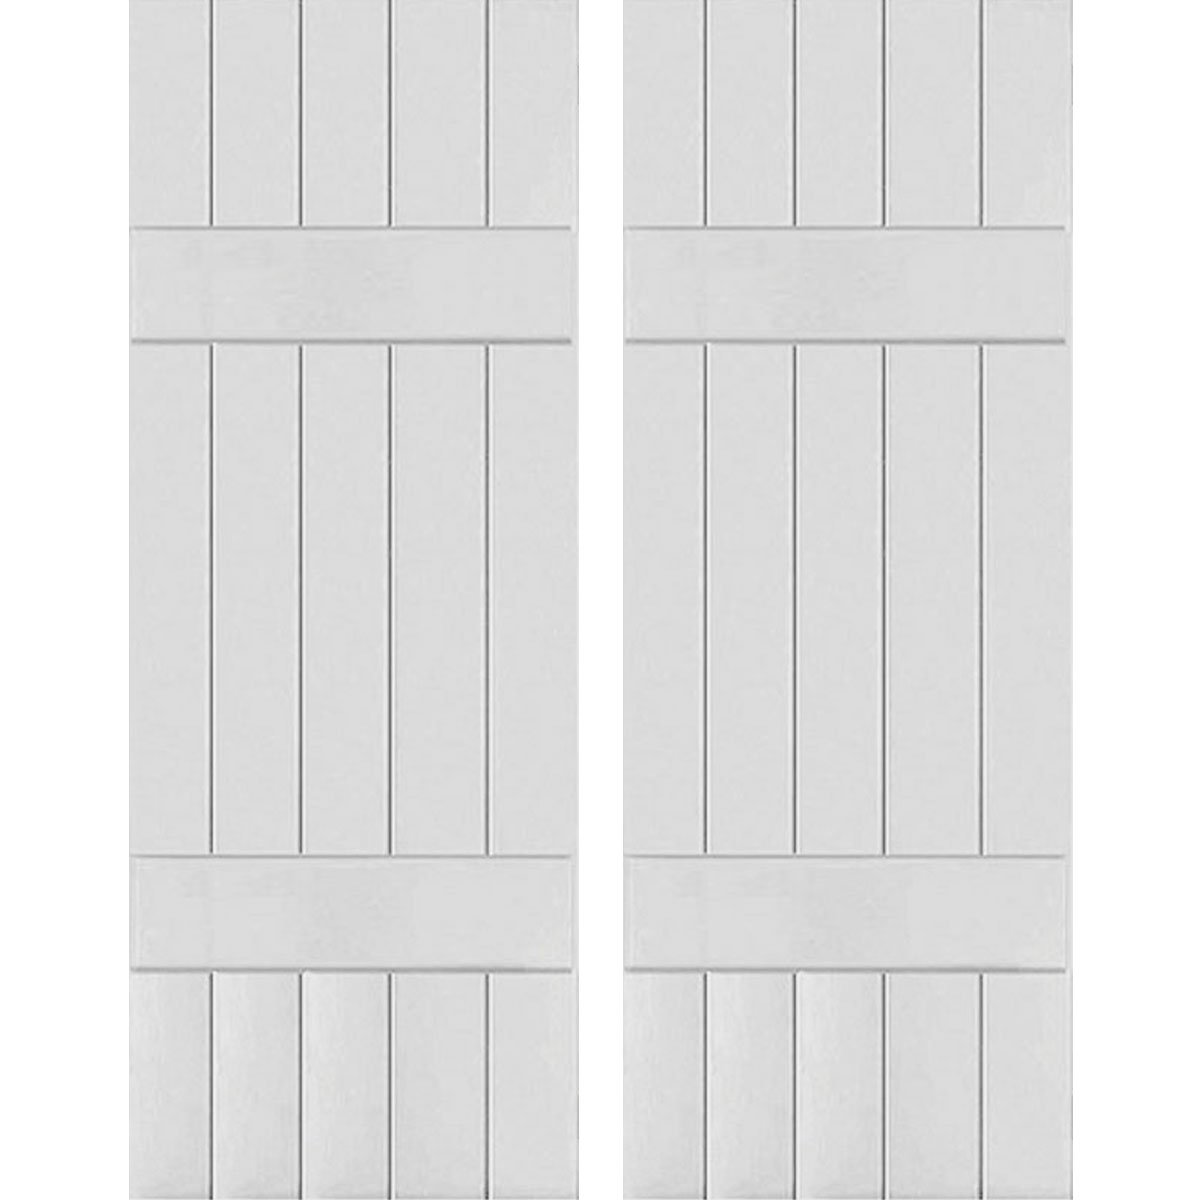 Ekena Millwork CWB18X047PRC Exterior Five Board